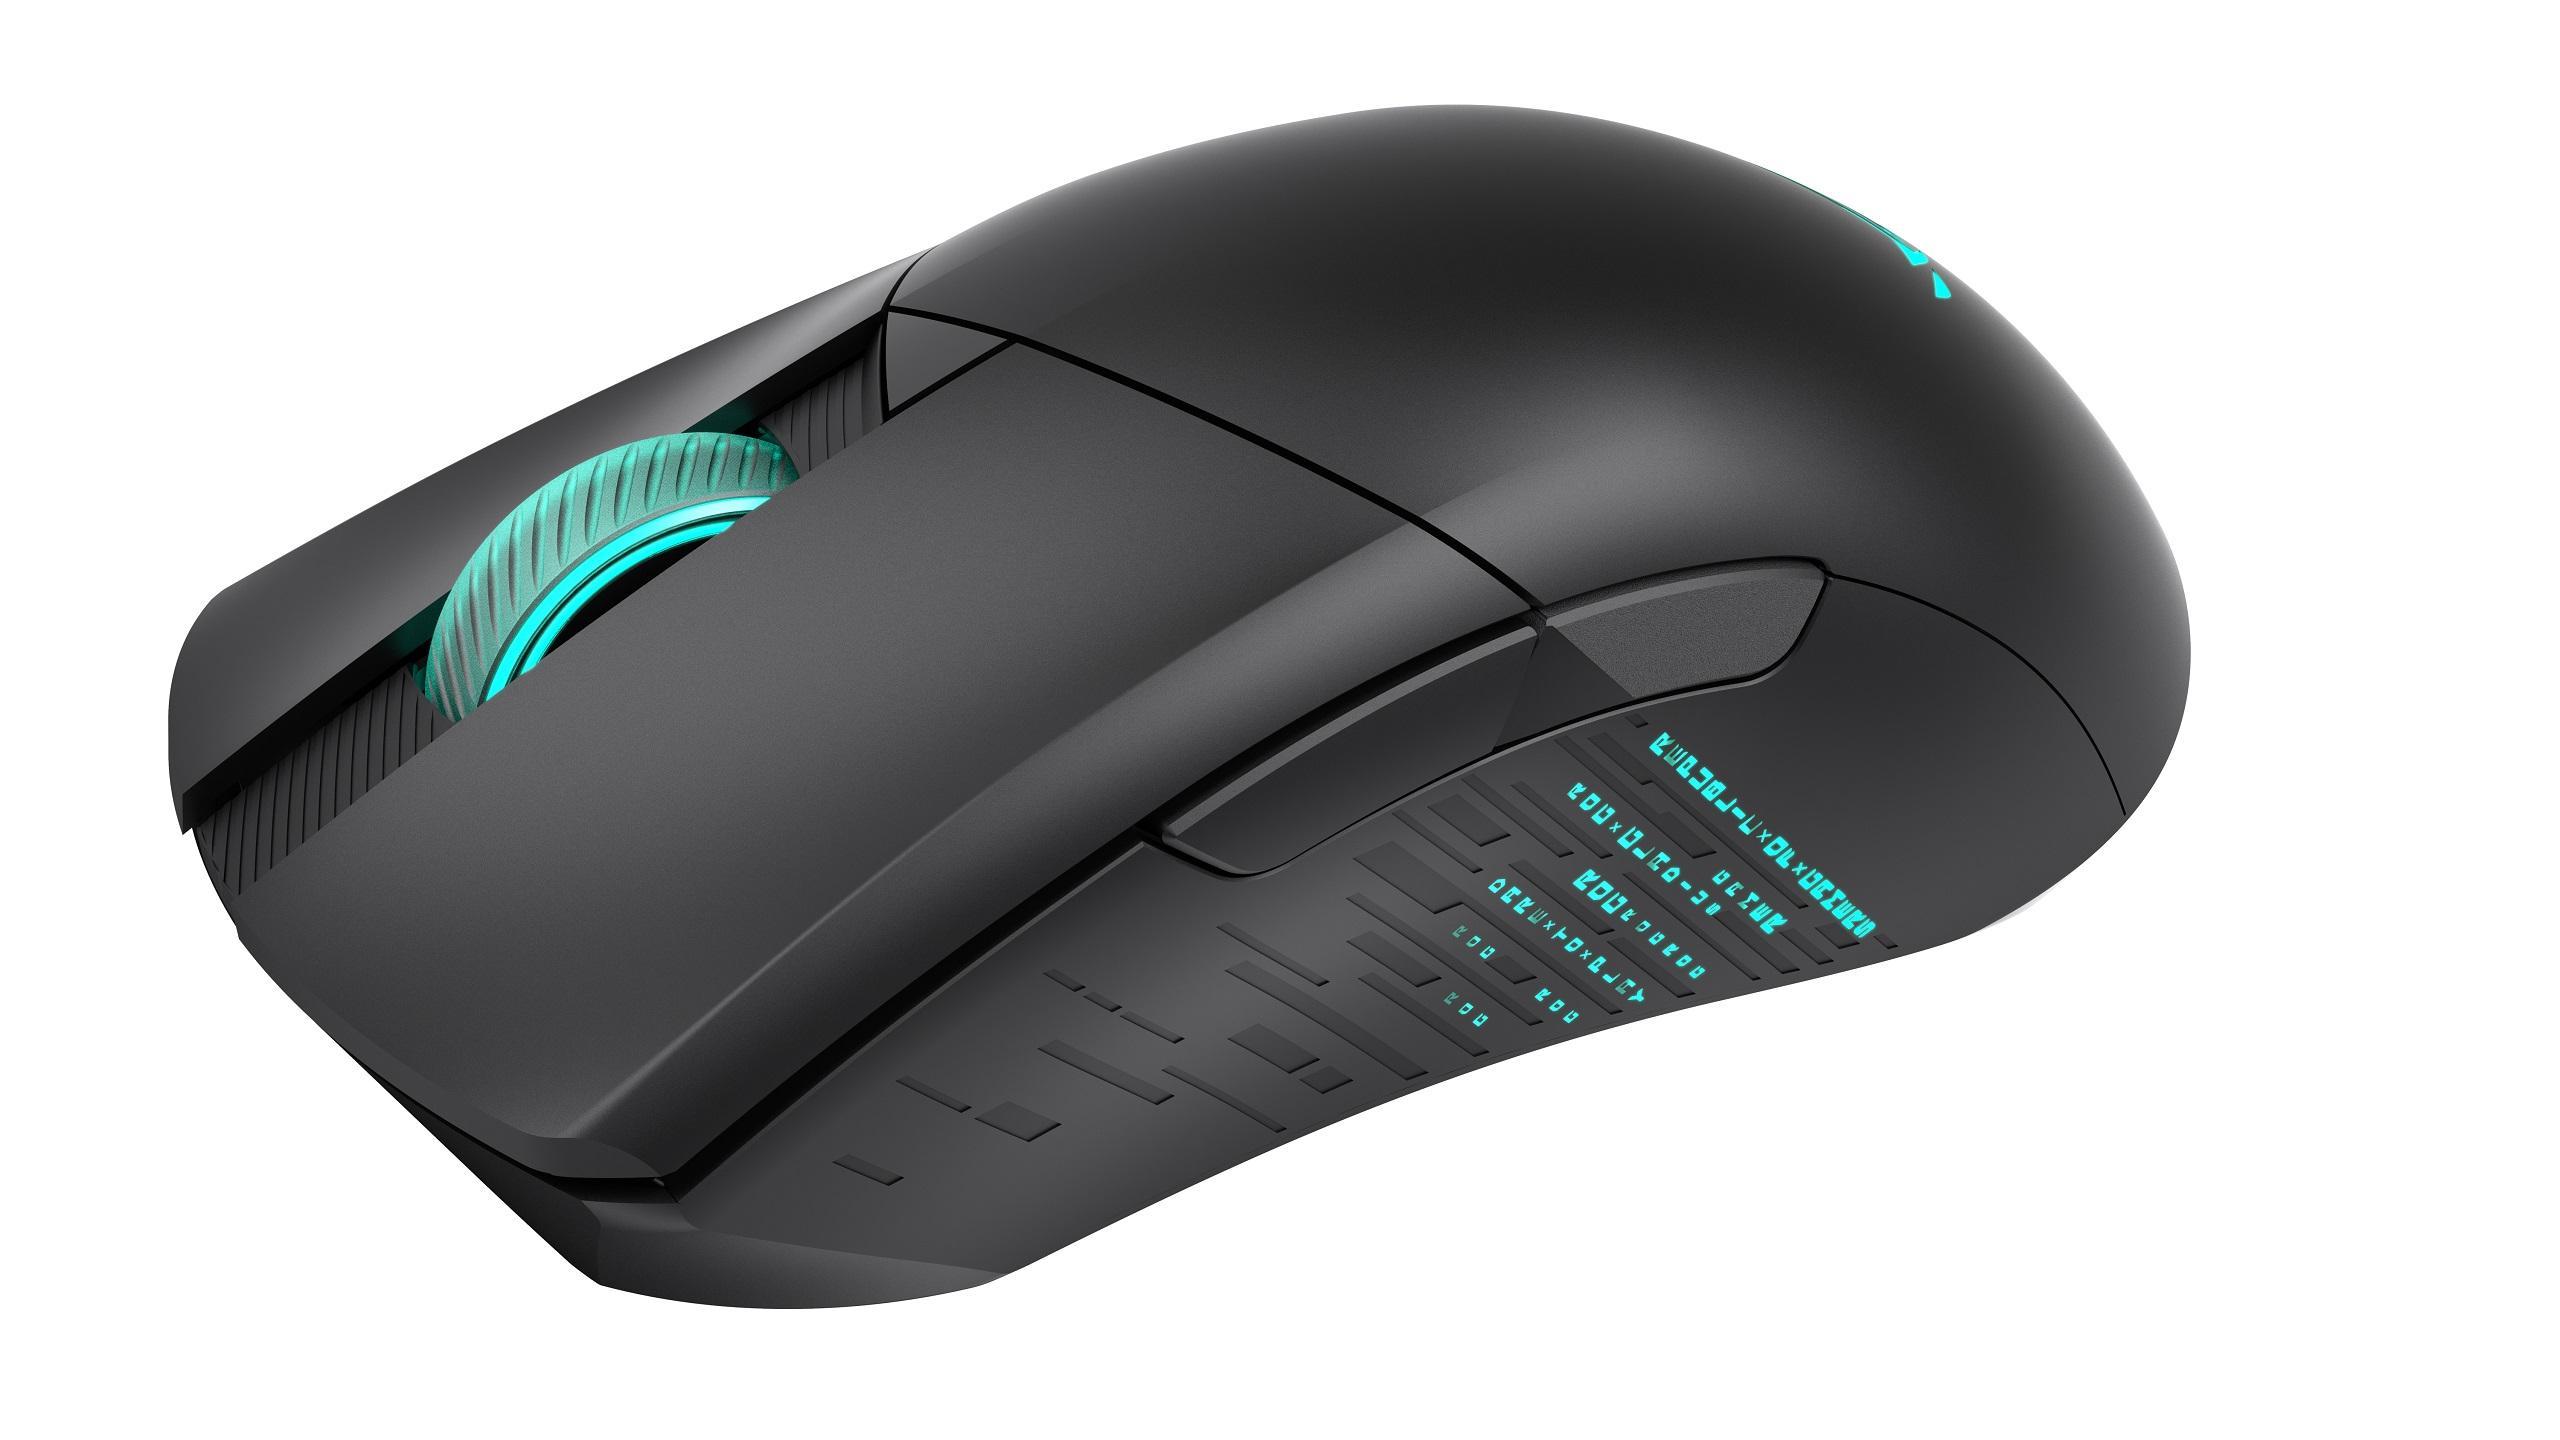 Asus Rog Gladius Iii Wireless Souris Mouse